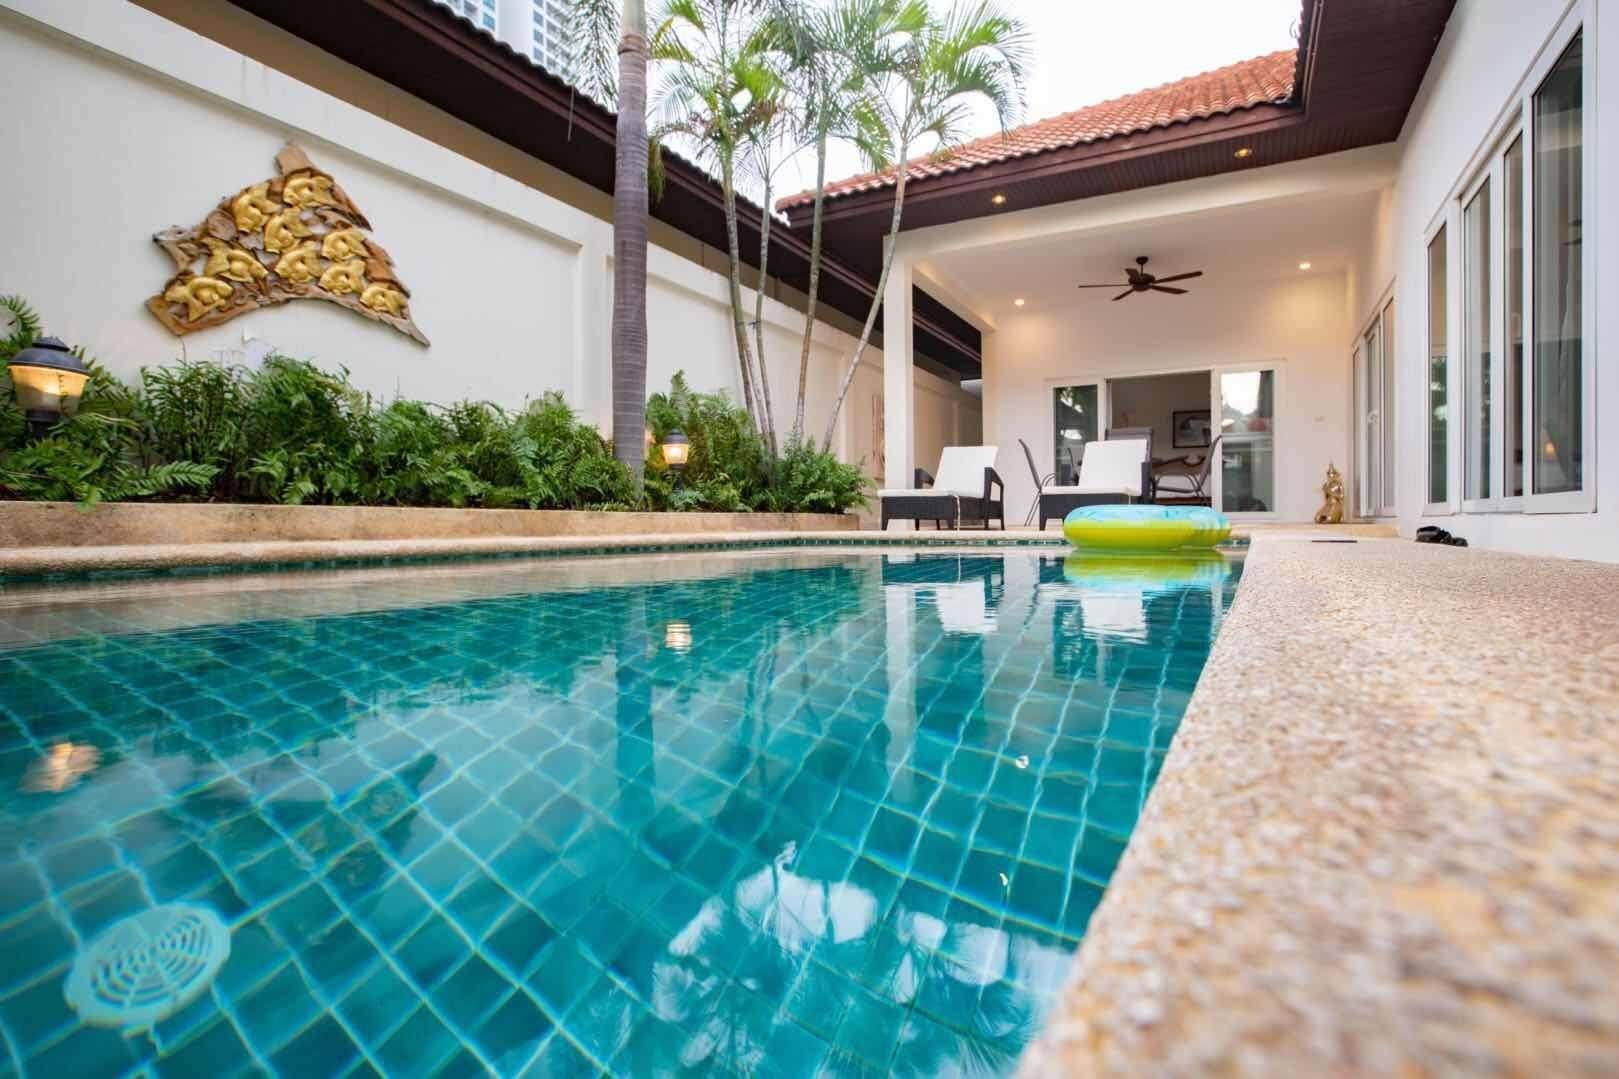 beachfront 3 bedroom Majestic pool villa วิลลา 3 ห้องนอน 2 ห้องน้ำส่วนตัว ขนาด 200 ตร.ม. – เขาพระตำหนัก